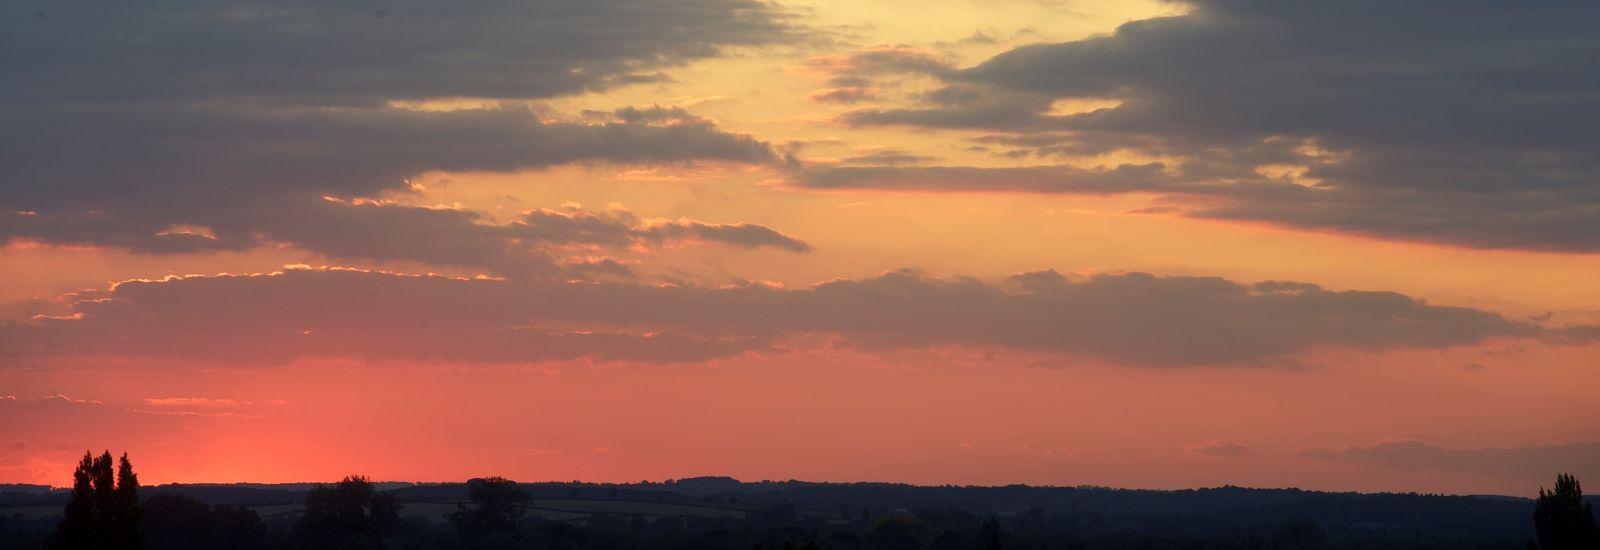 Oxford sky at dusk, UK.